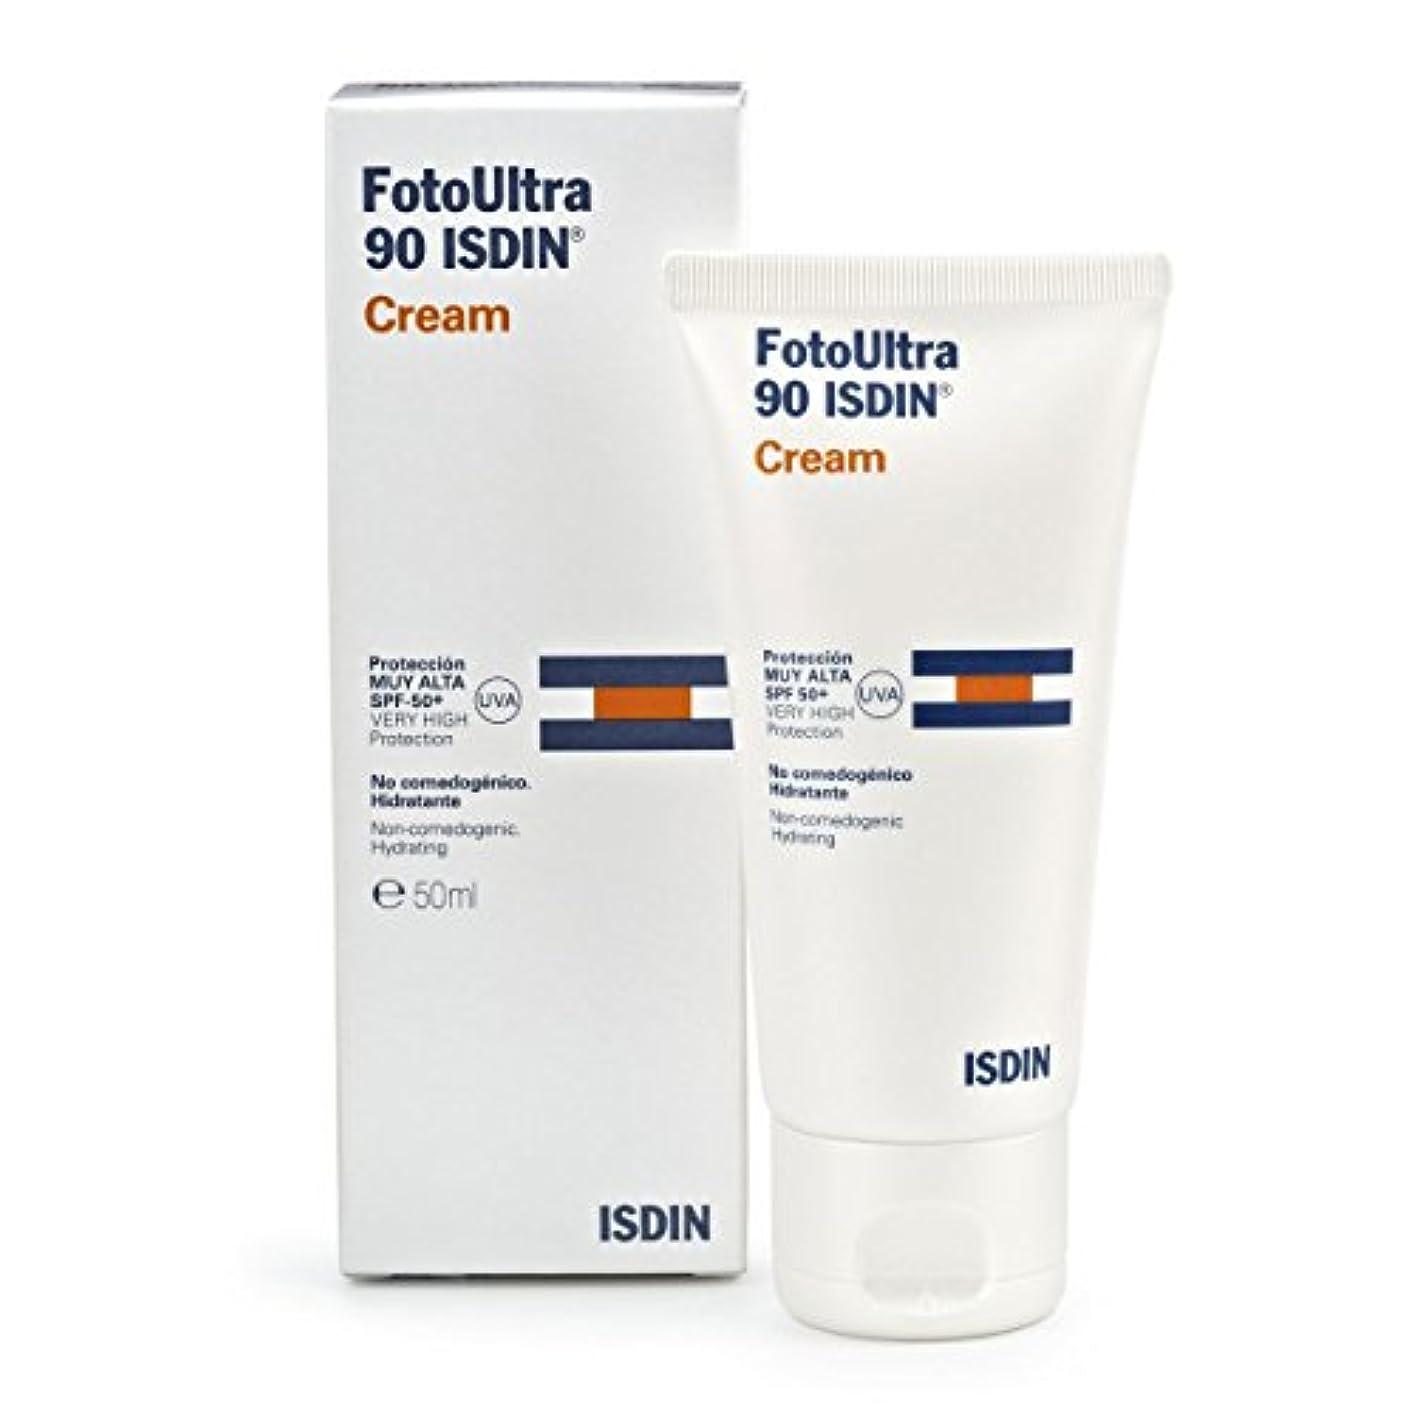 Isdin Fotoultra 90 Cream 50ml [並行輸入品]